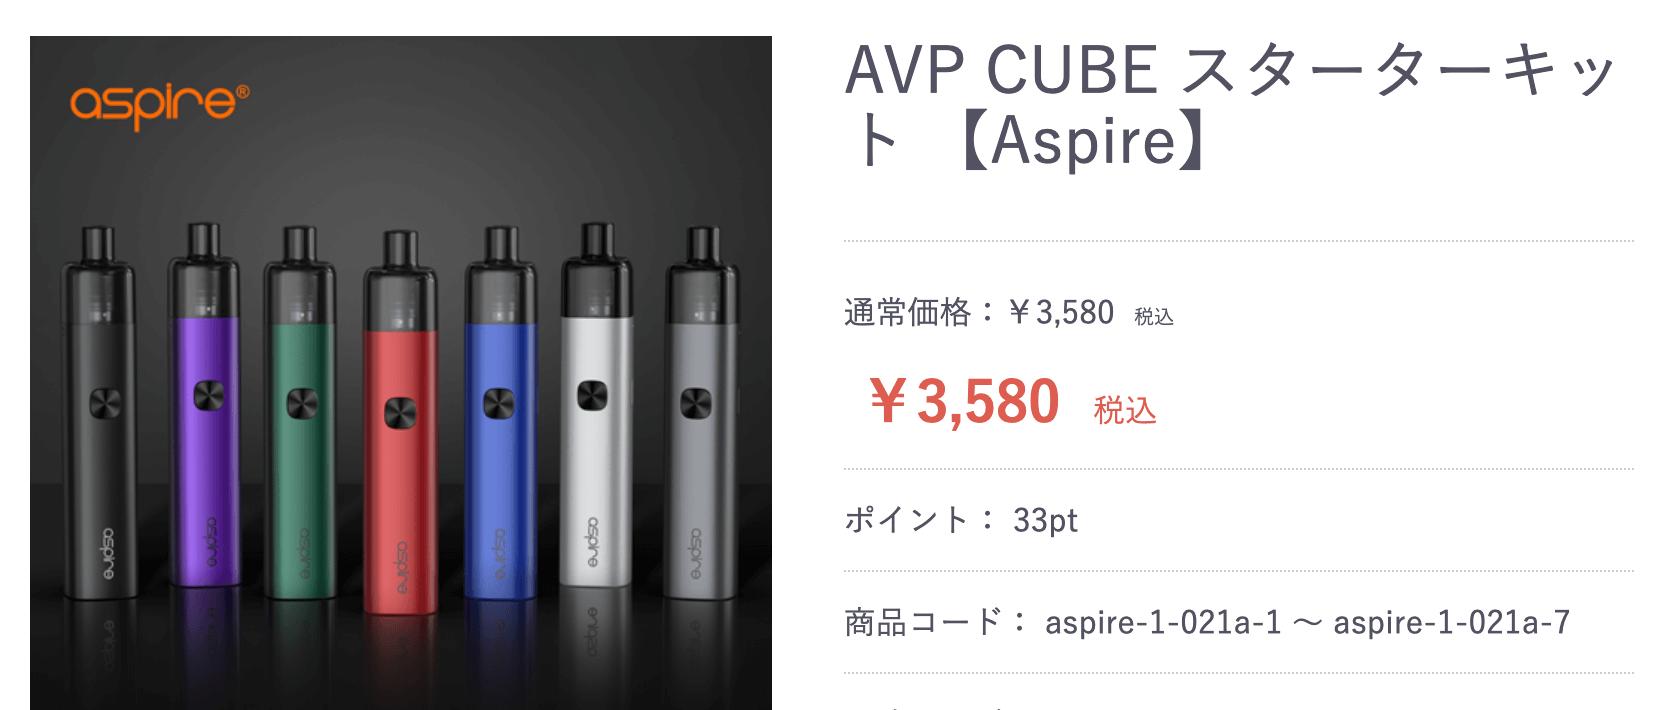 AVP CUBEの販売ページ